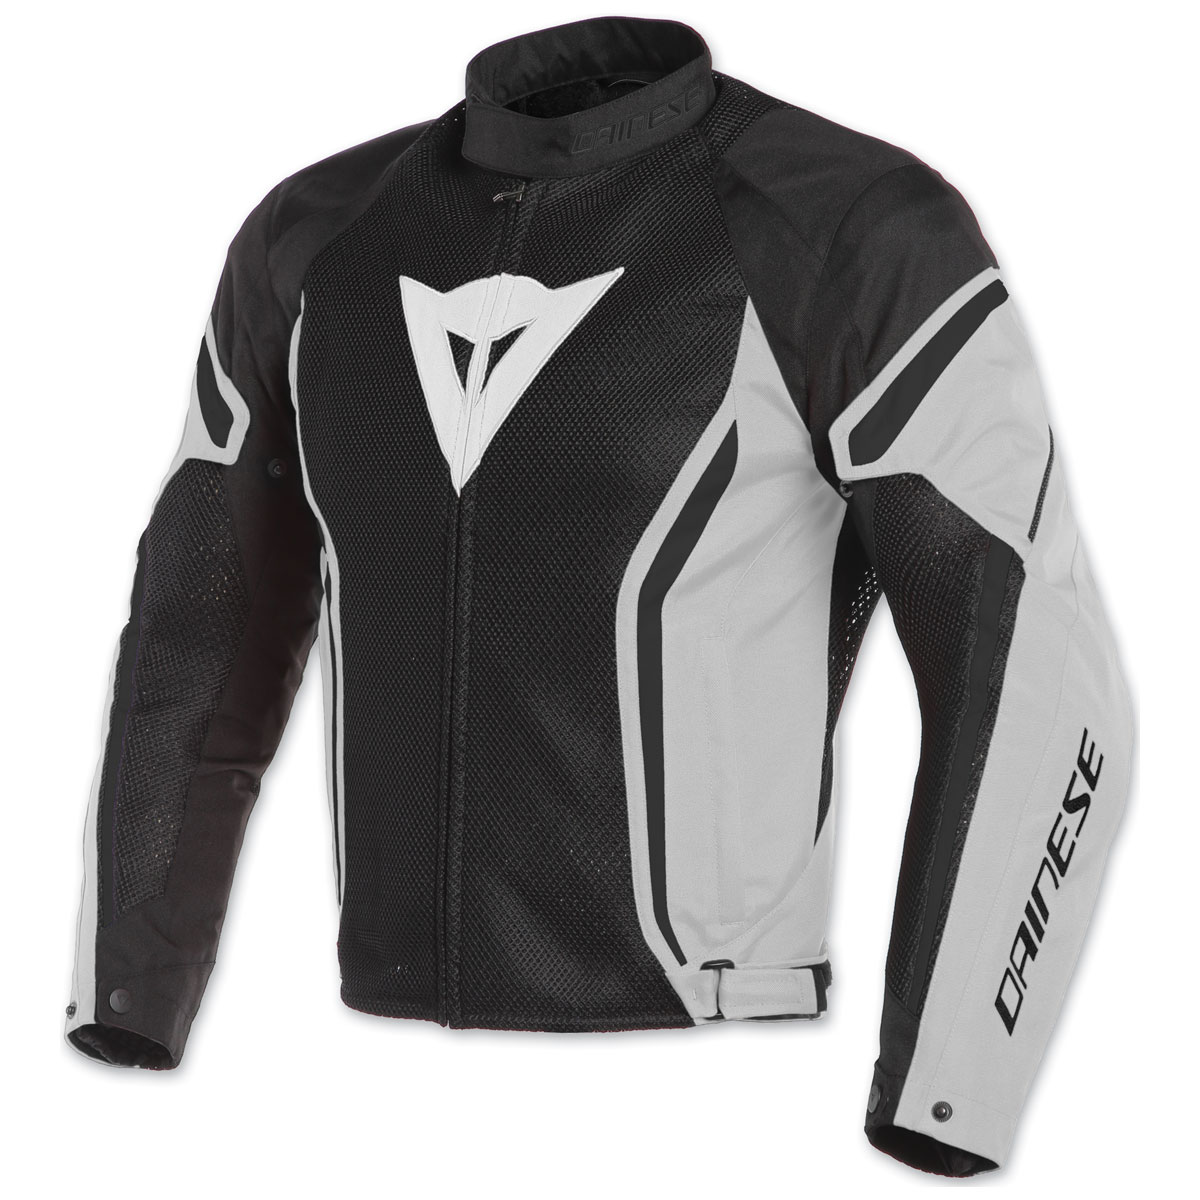 Dainese Men's Air Crono 2 Black/Glacier Gray/Black Textile Jacket